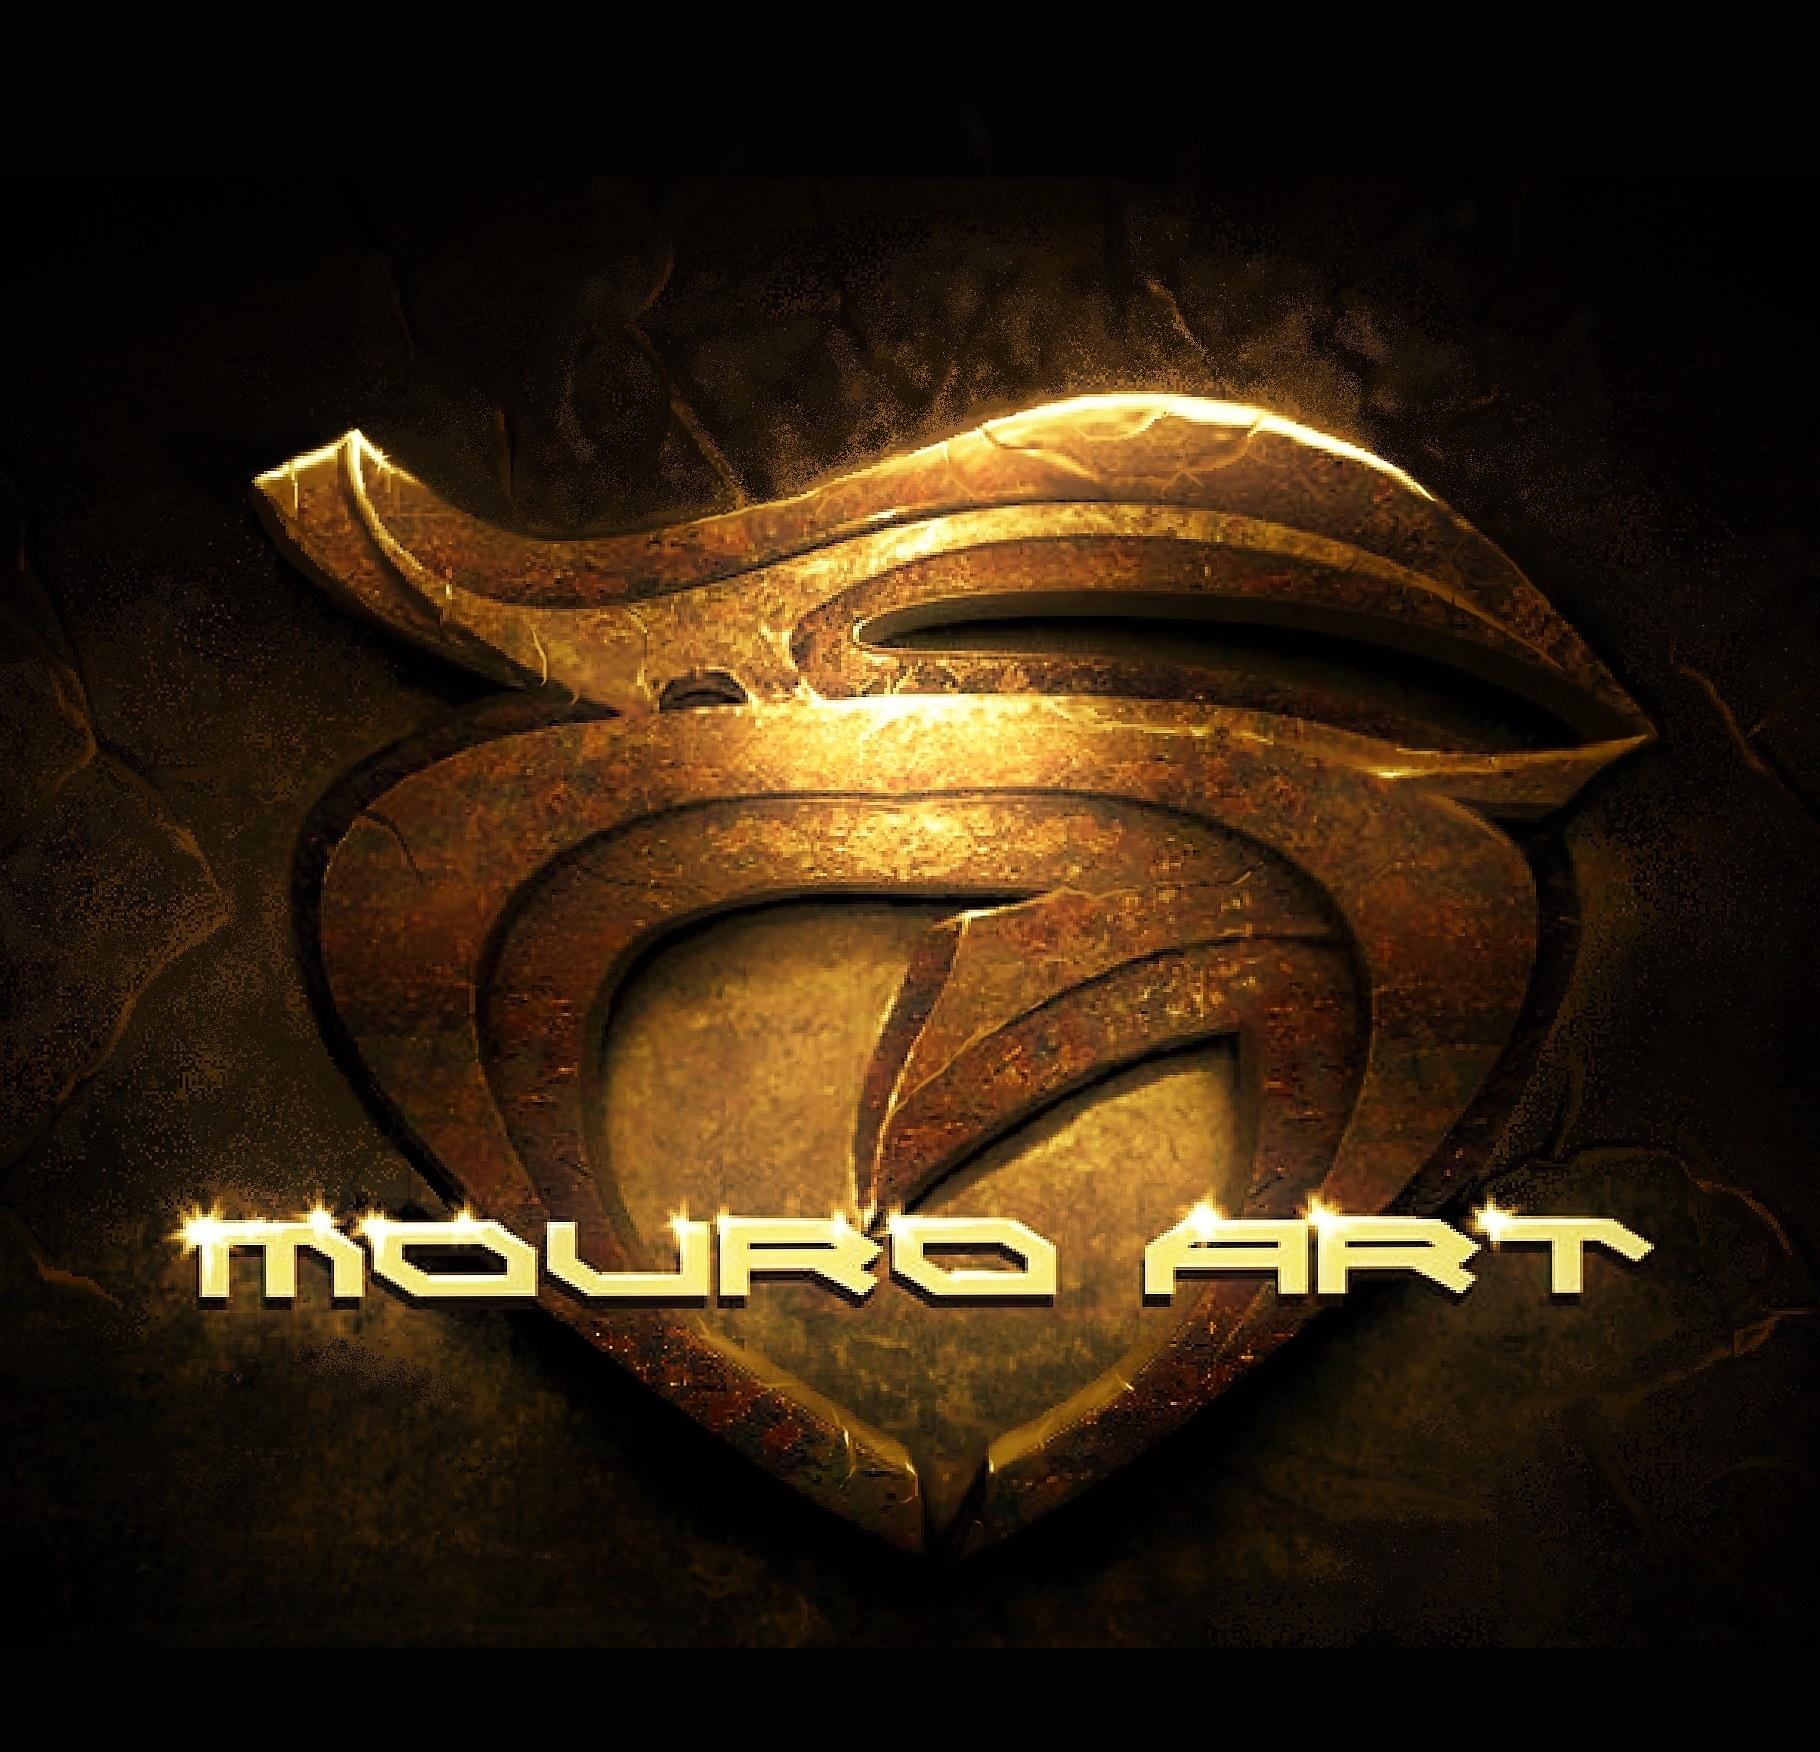 mouroart's Signature